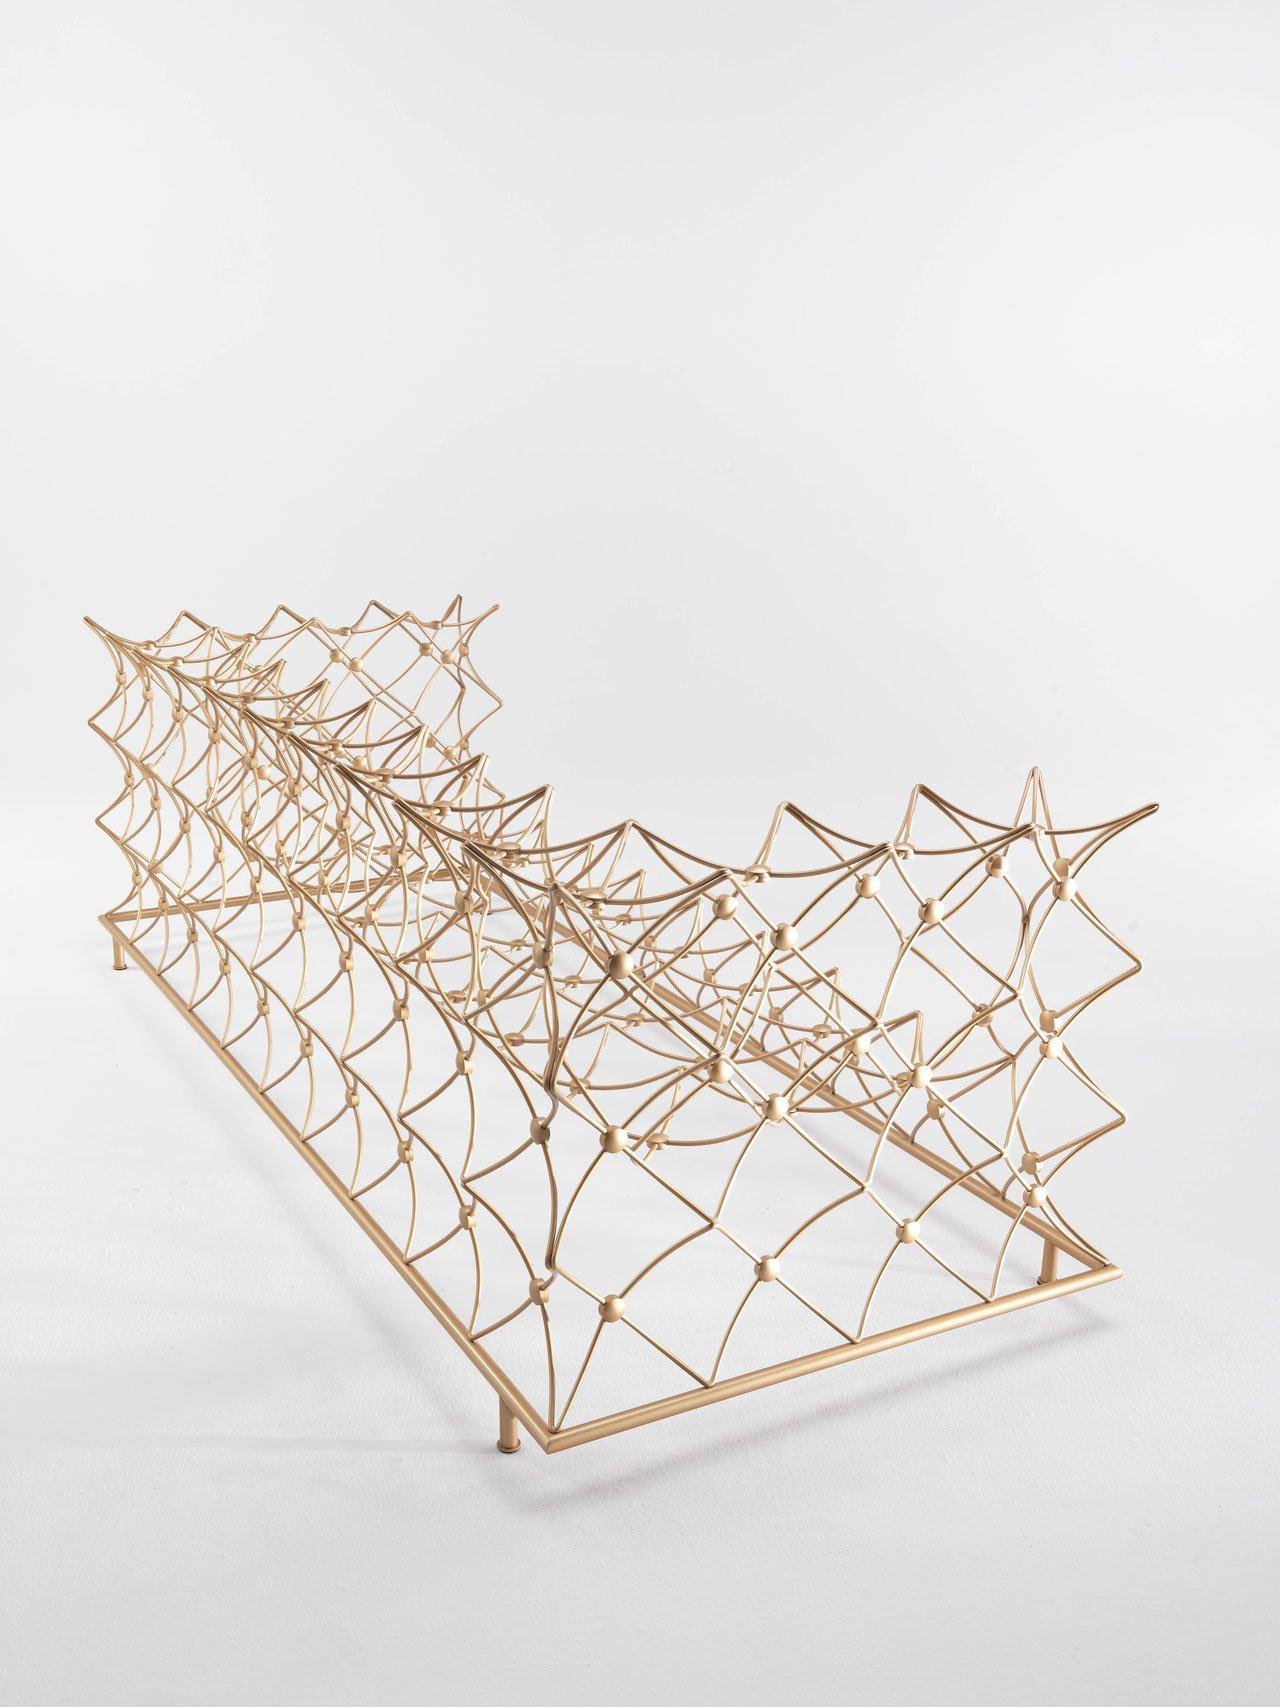 "ORAURO sofa by Emanuele Magini for JCP Universe.Materials: iron structure in ""tailor made"" gold finish.Dimensions (H x W x D): 85cm x 247cm x 100cm.Photo by Silvio Macchi © JCP Universe."